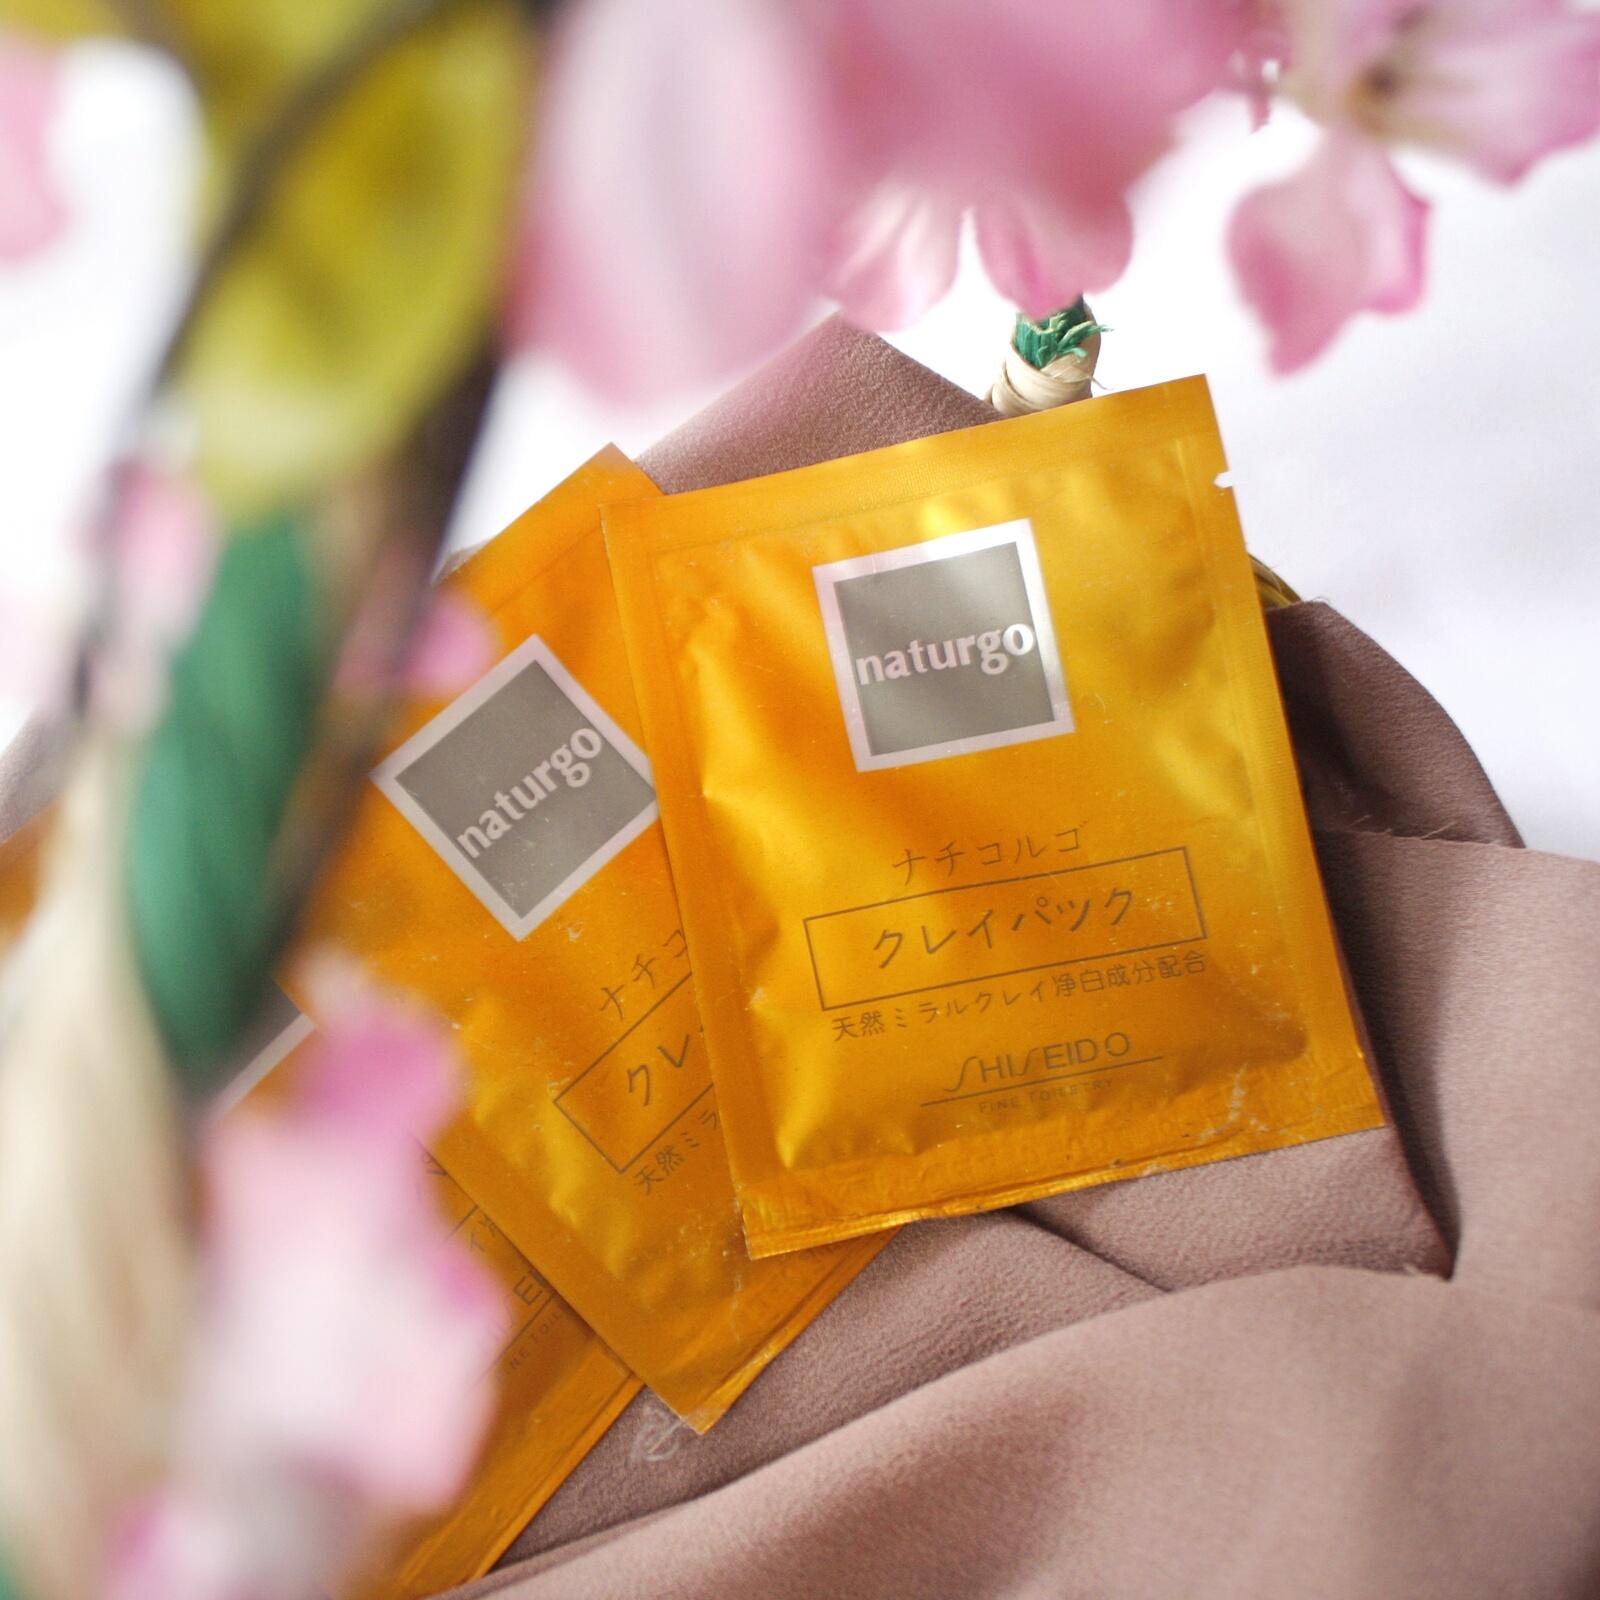 Skincare Palsu Dan 5 Tips Sebelum Membeli Atau Kosmetik Naturgo Masker Iya Yang Saya Maksud Itu Adalah Katanya Keluaran Shiseido Clay Berwarna Hitam Pekat Dipercaya Bisa Mengangkat Komedo Ini